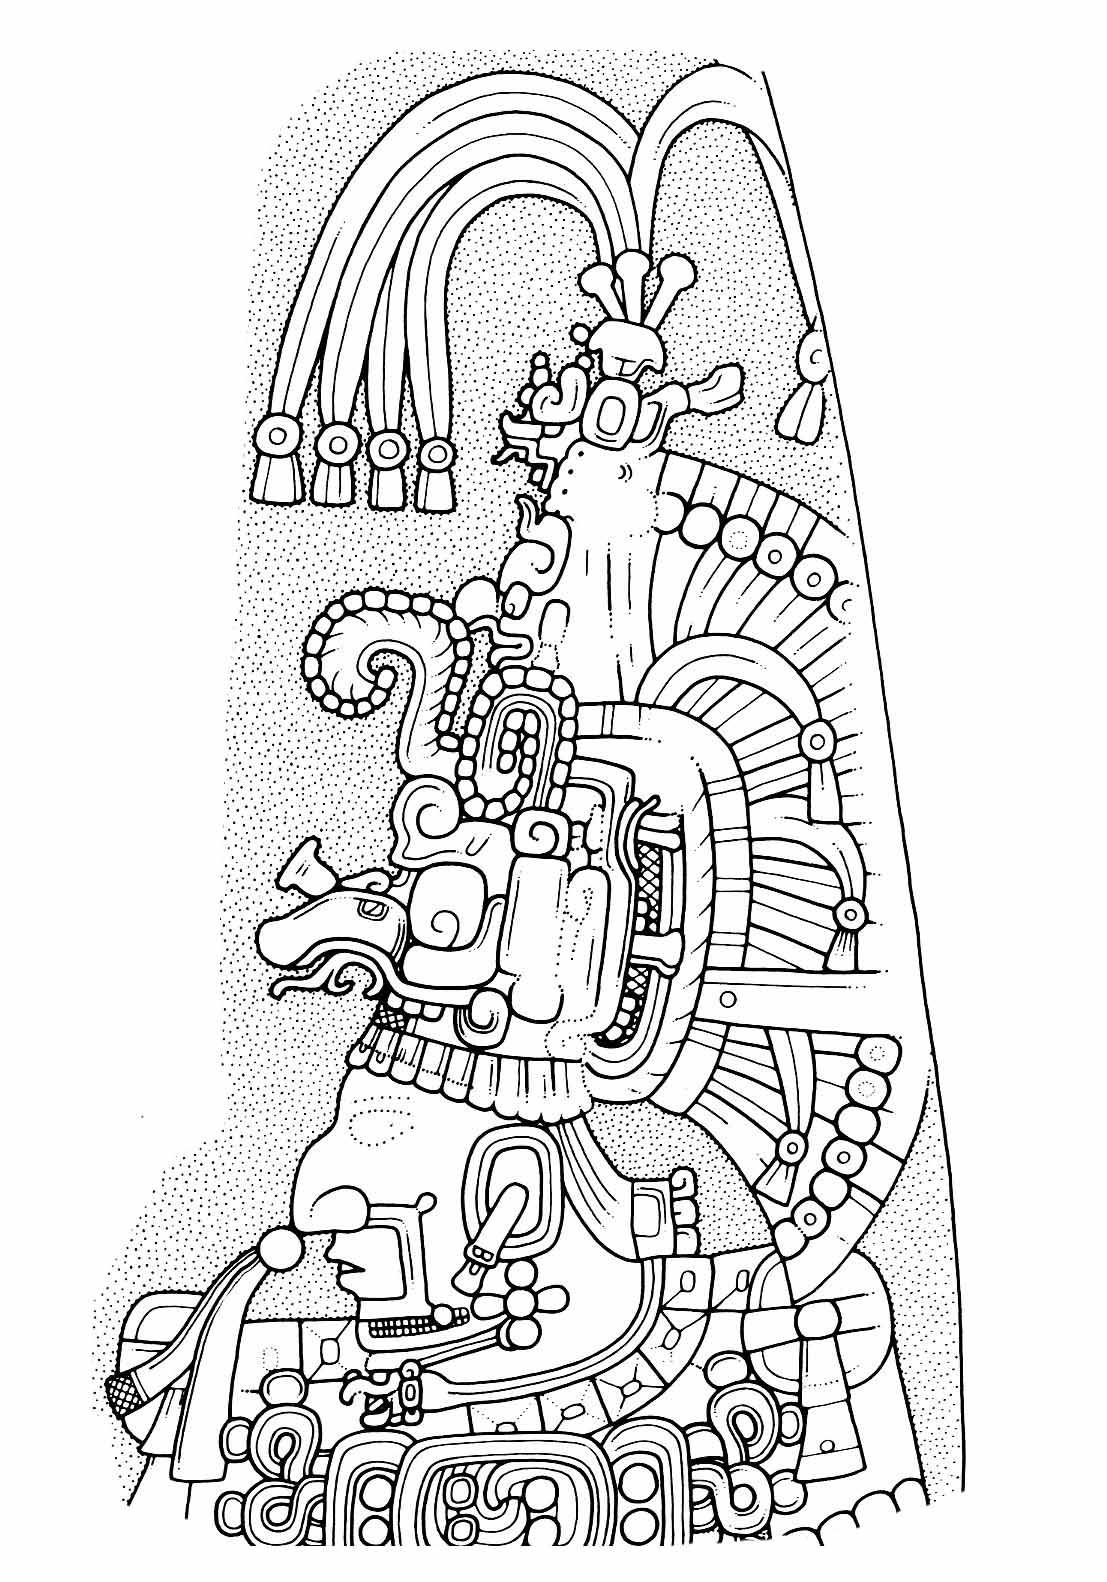 Simple Mayan Calendar Drawing : Simple mayan drawings imgkid the image kid has it